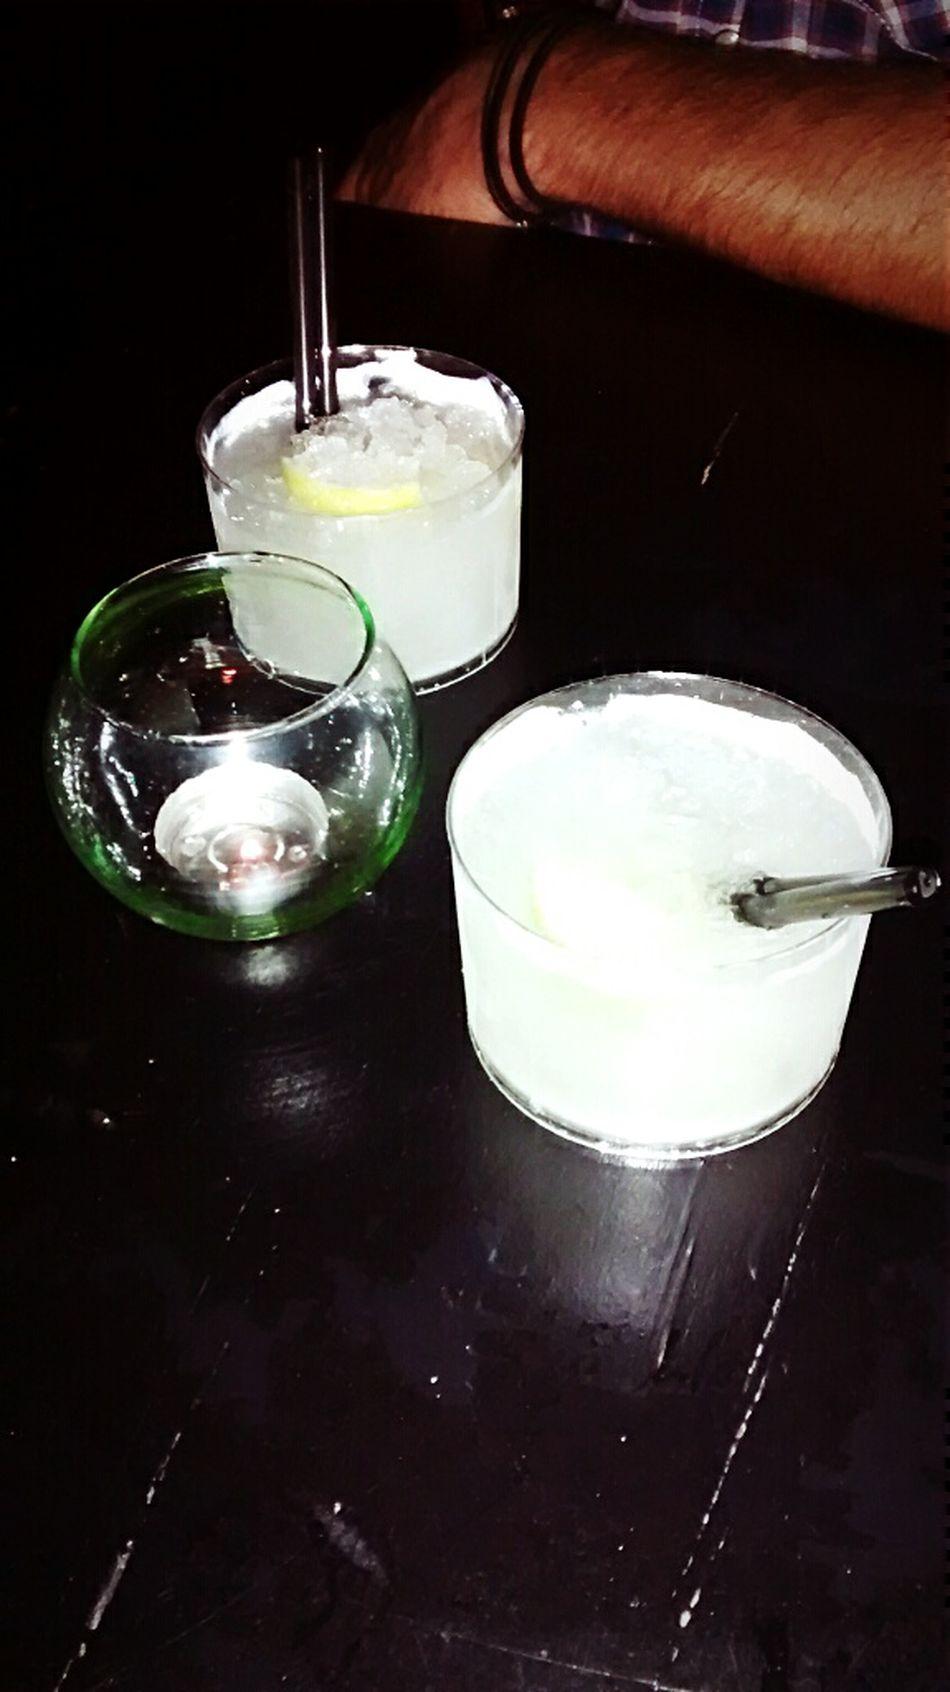 Noche Brasilera! Caipirinhas Saturdaynight Last Drink, I Promise